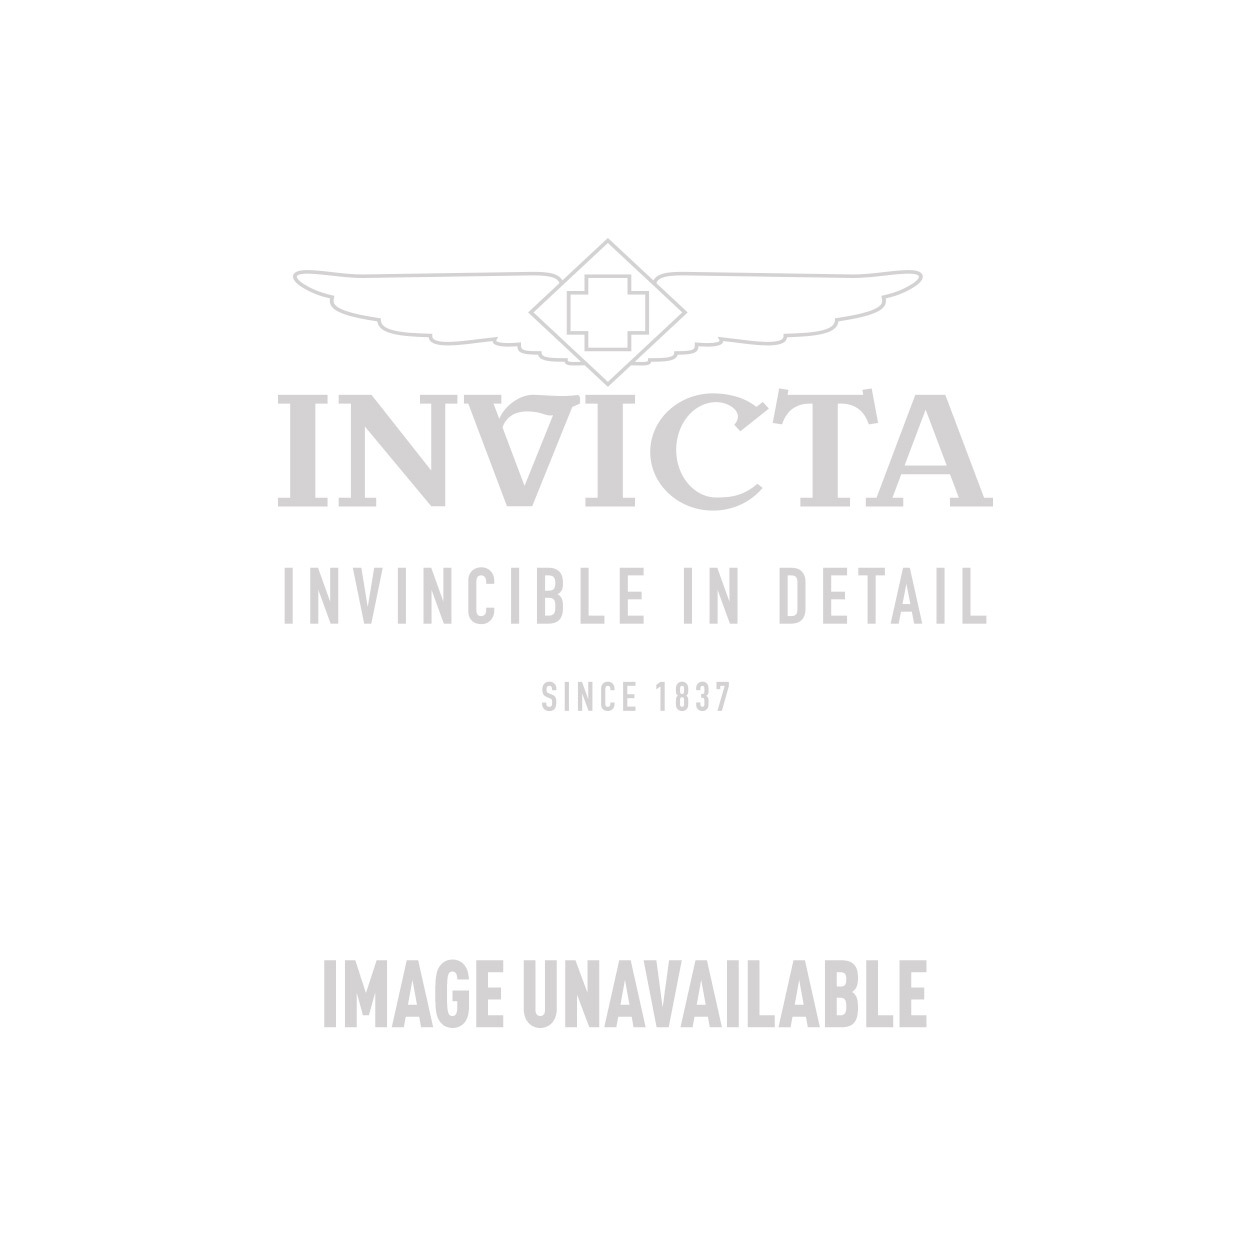 Invicta Corduba Swiss Movement Quartz Watch - Black case with Black, White tone Stainless Steel, Polyurethane band - Model 80216